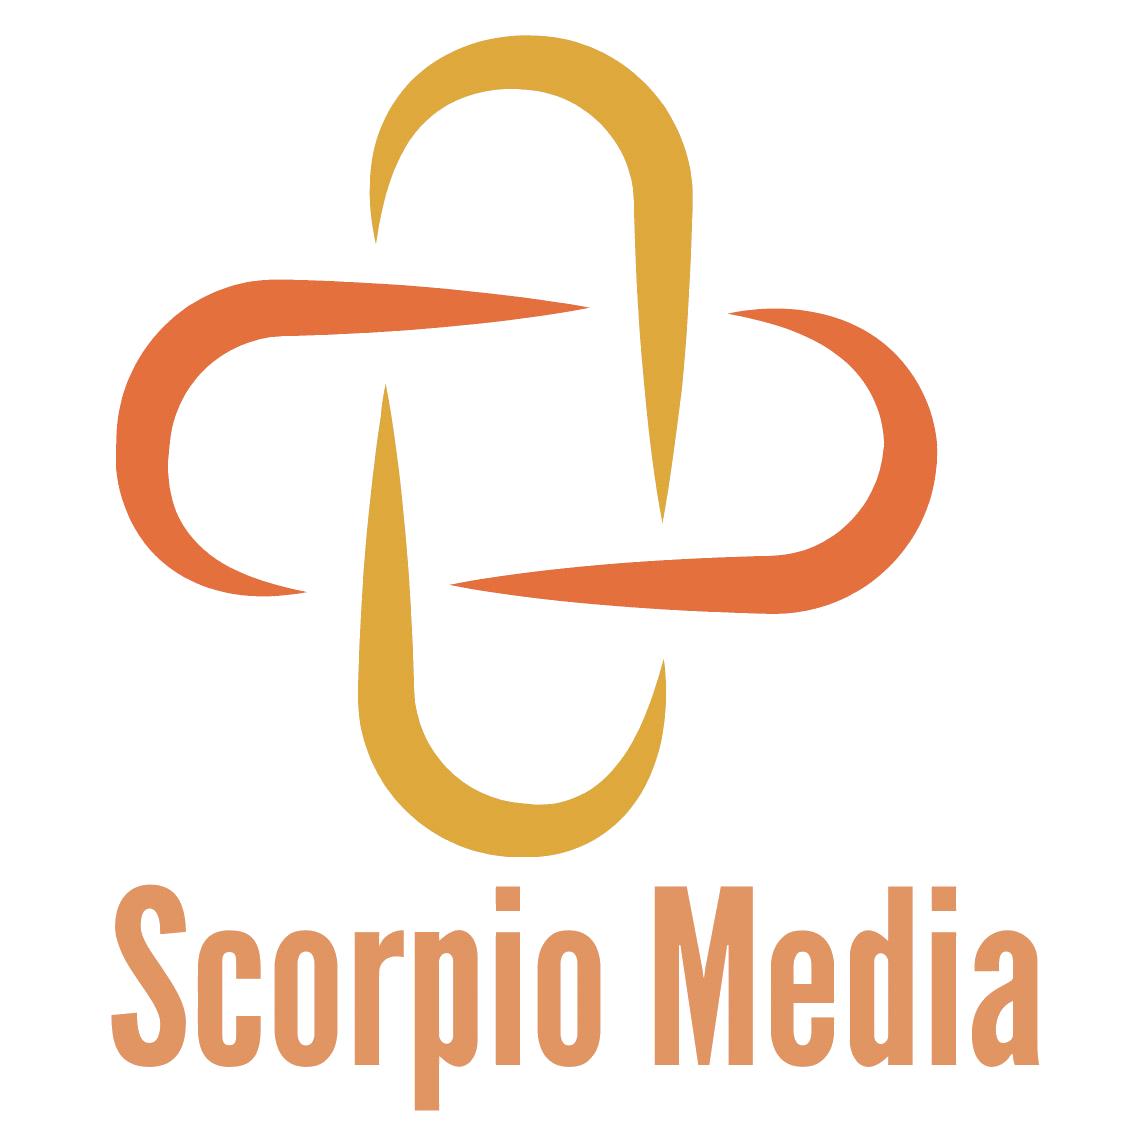 Scorpio Media Group Brand